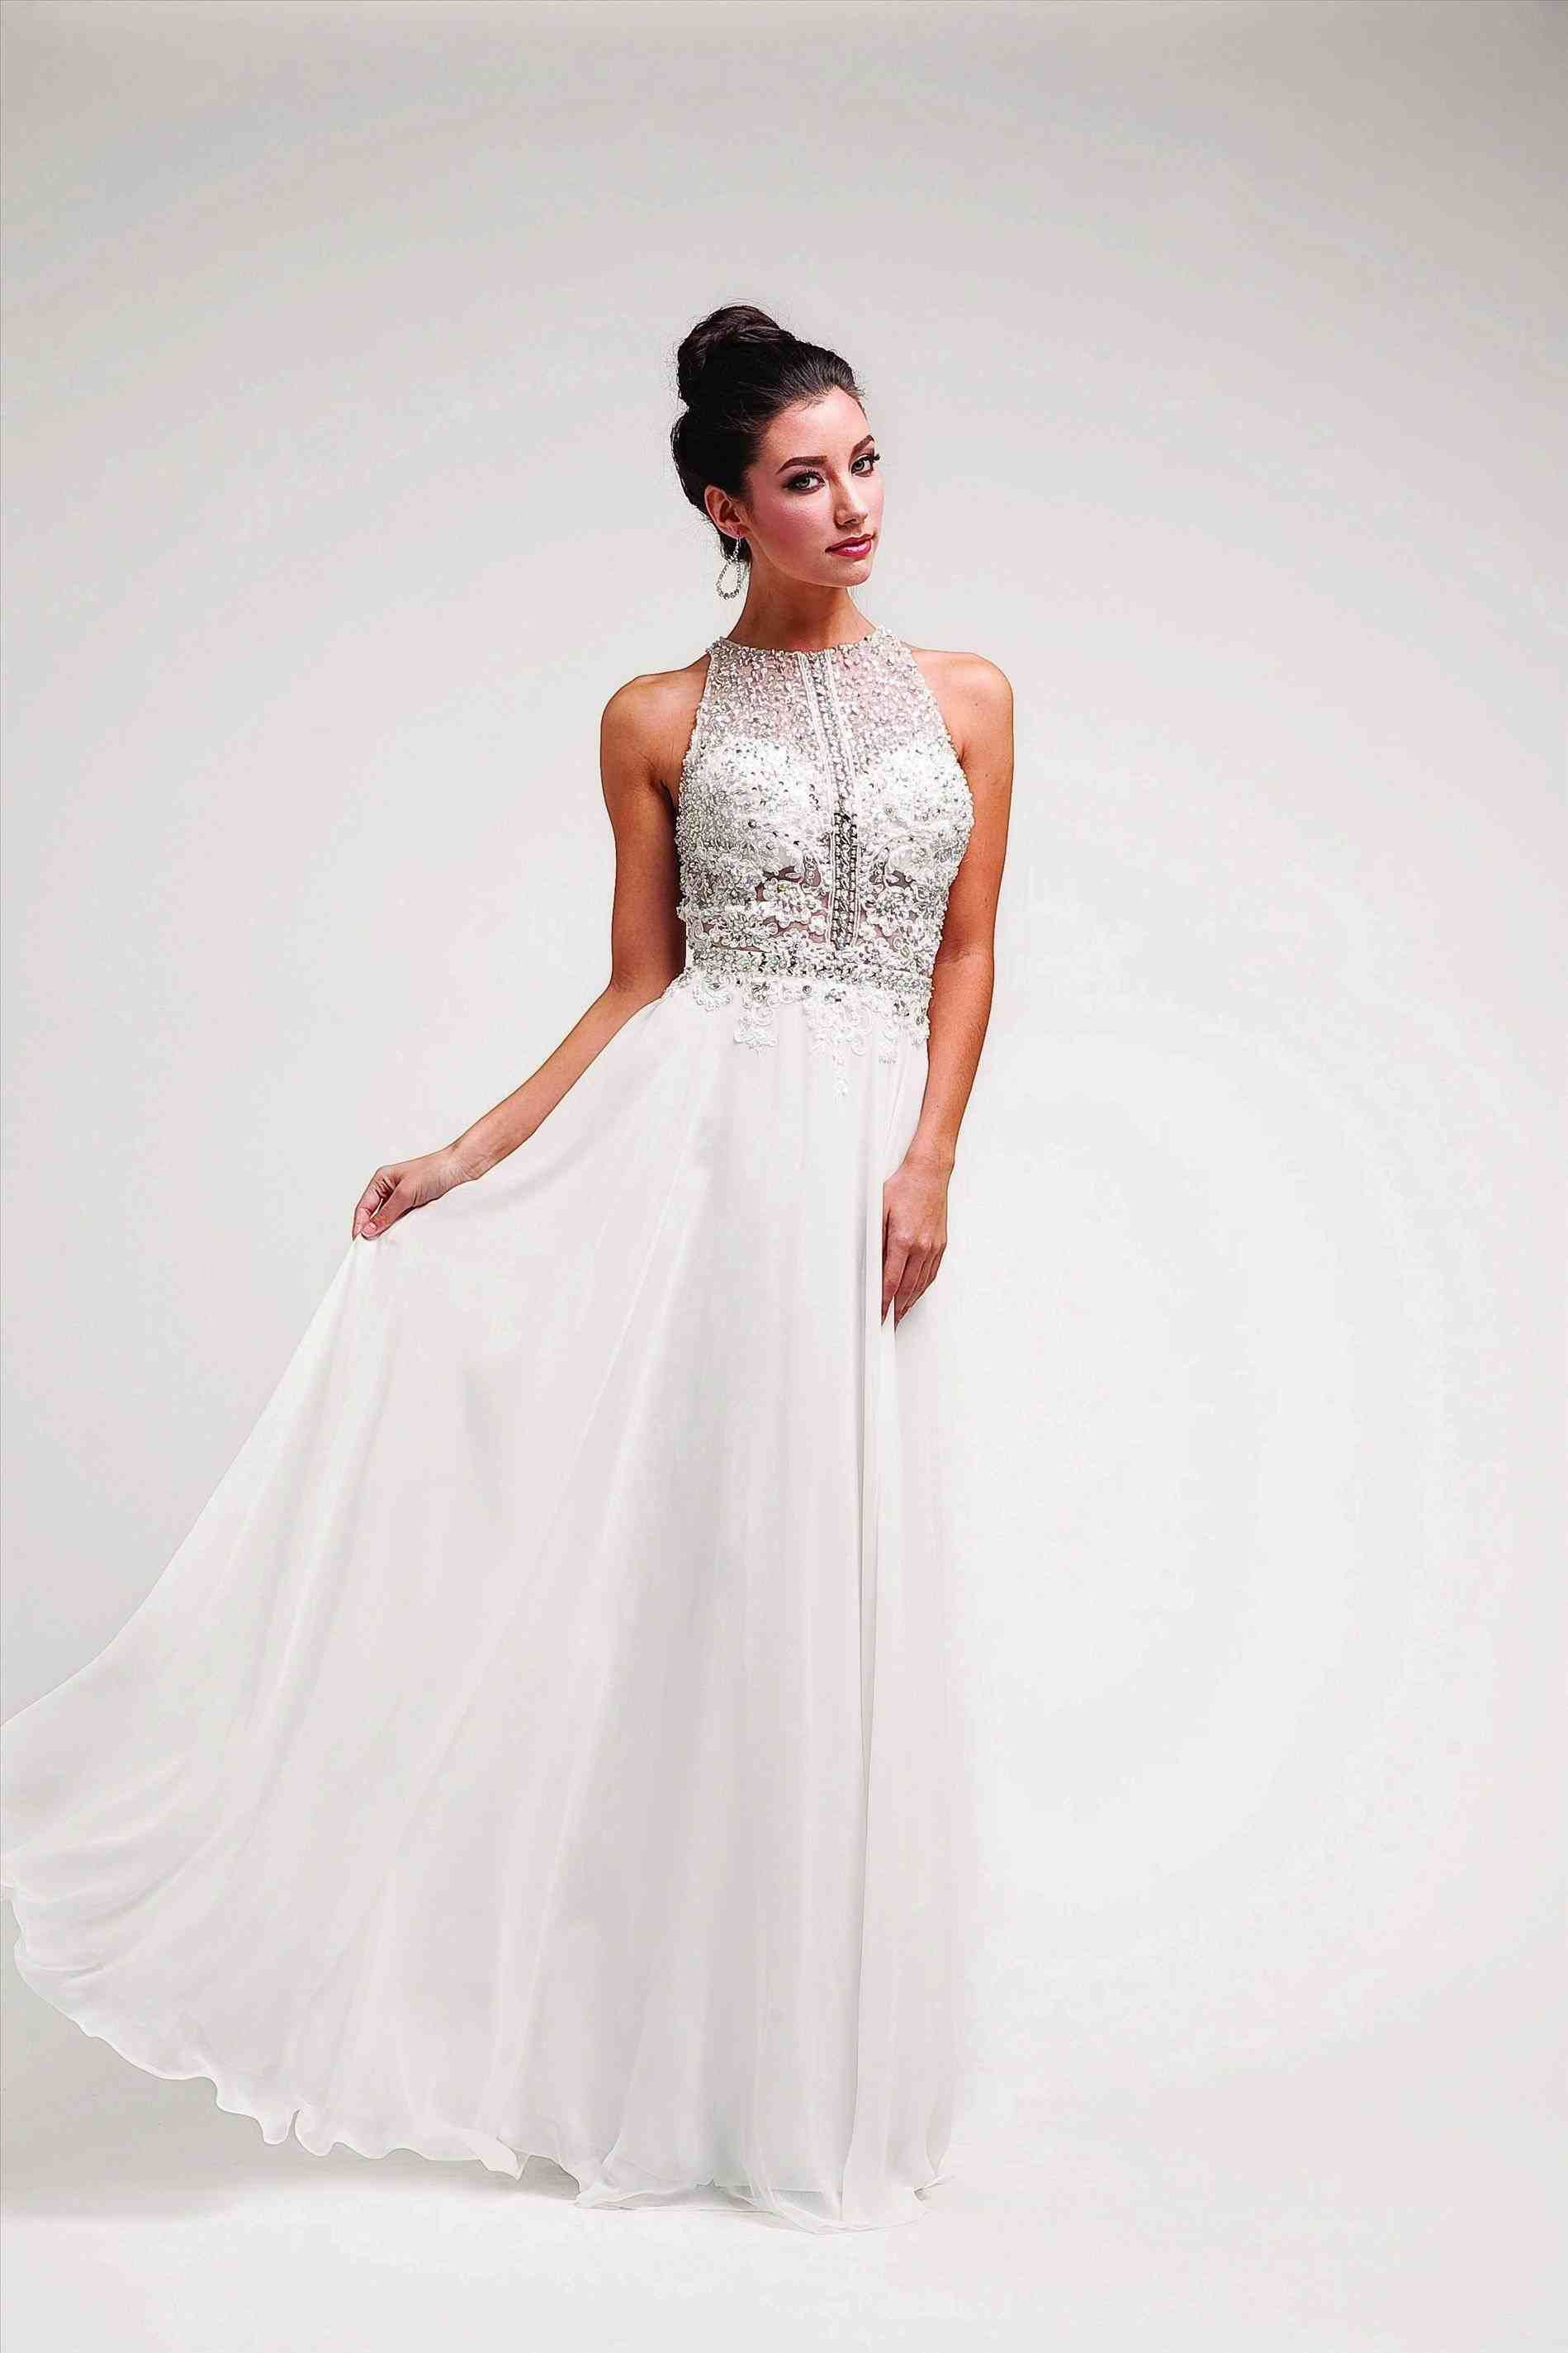 Long White Winter Formal Dresses White Tulle Sliver Sequins V Neck Long Halter Lace Up Wedding Dress Long Wi Formal Prom Dresses Long Formal Dresses Dresses [ 2849 x 1899 Pixel ]